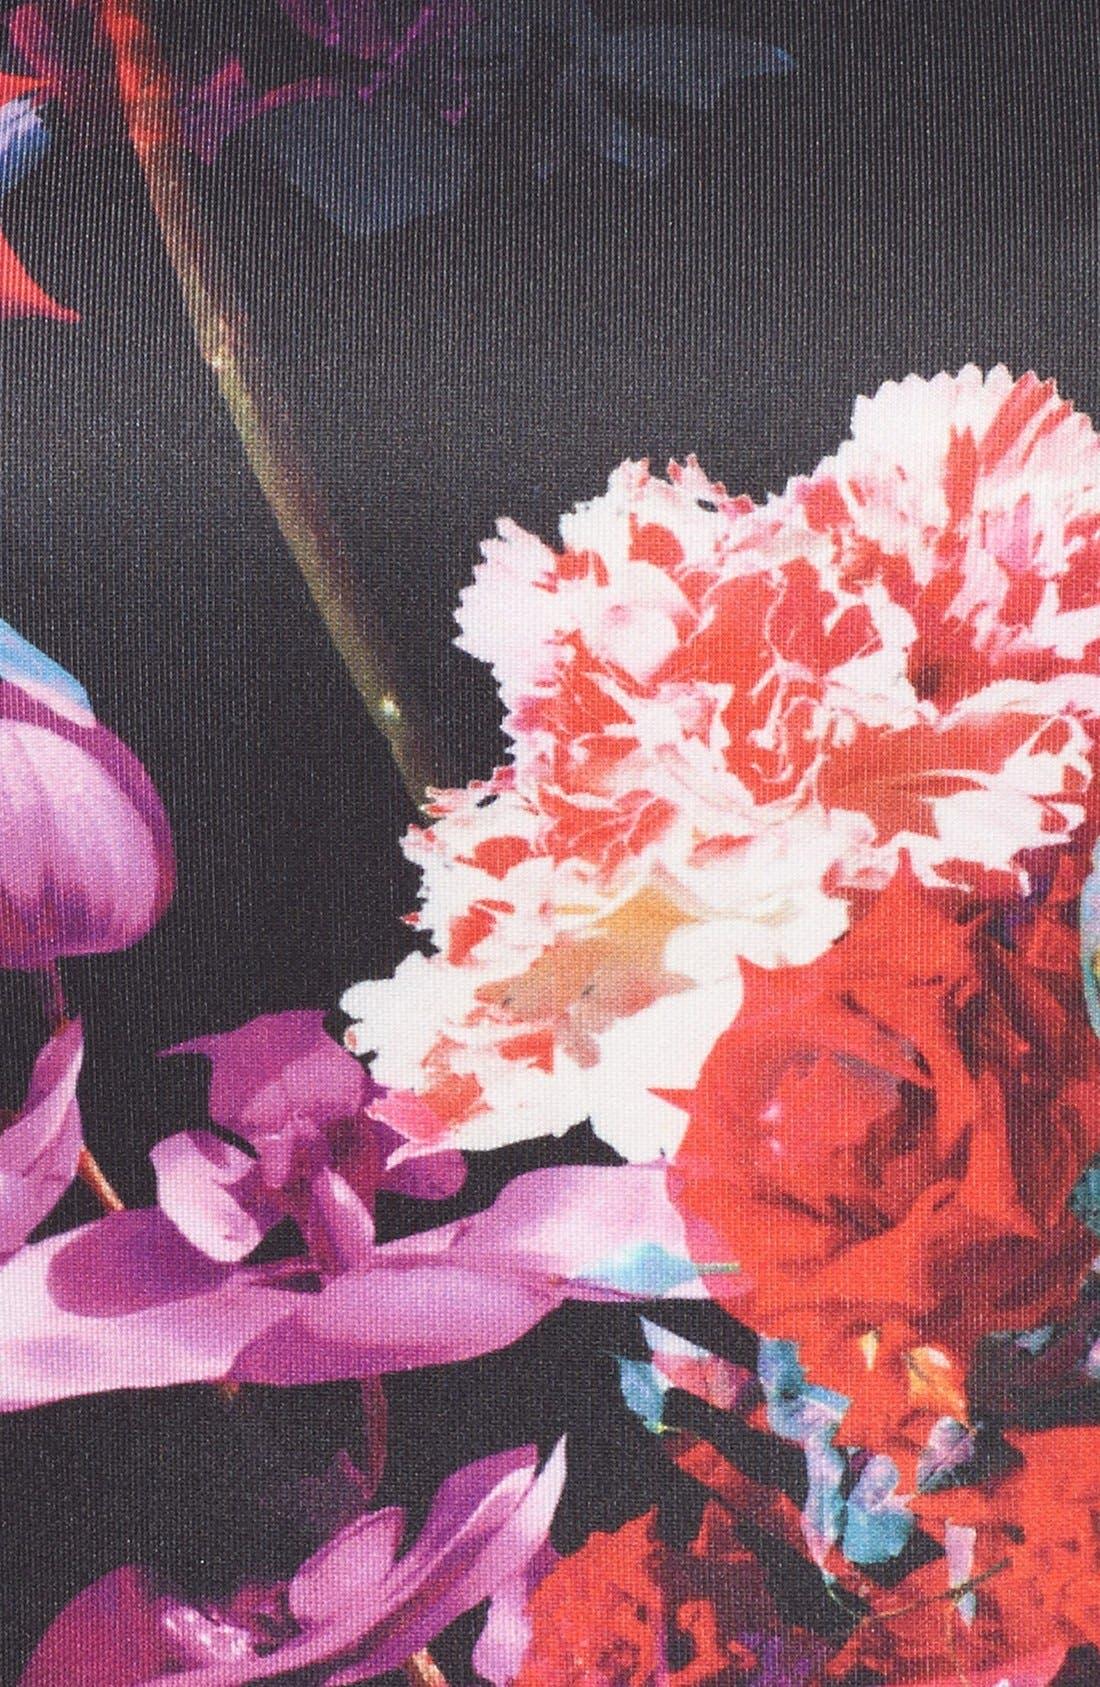 Floral Print Knit Sheath Dress,                             Alternate thumbnail 4, color,                             006